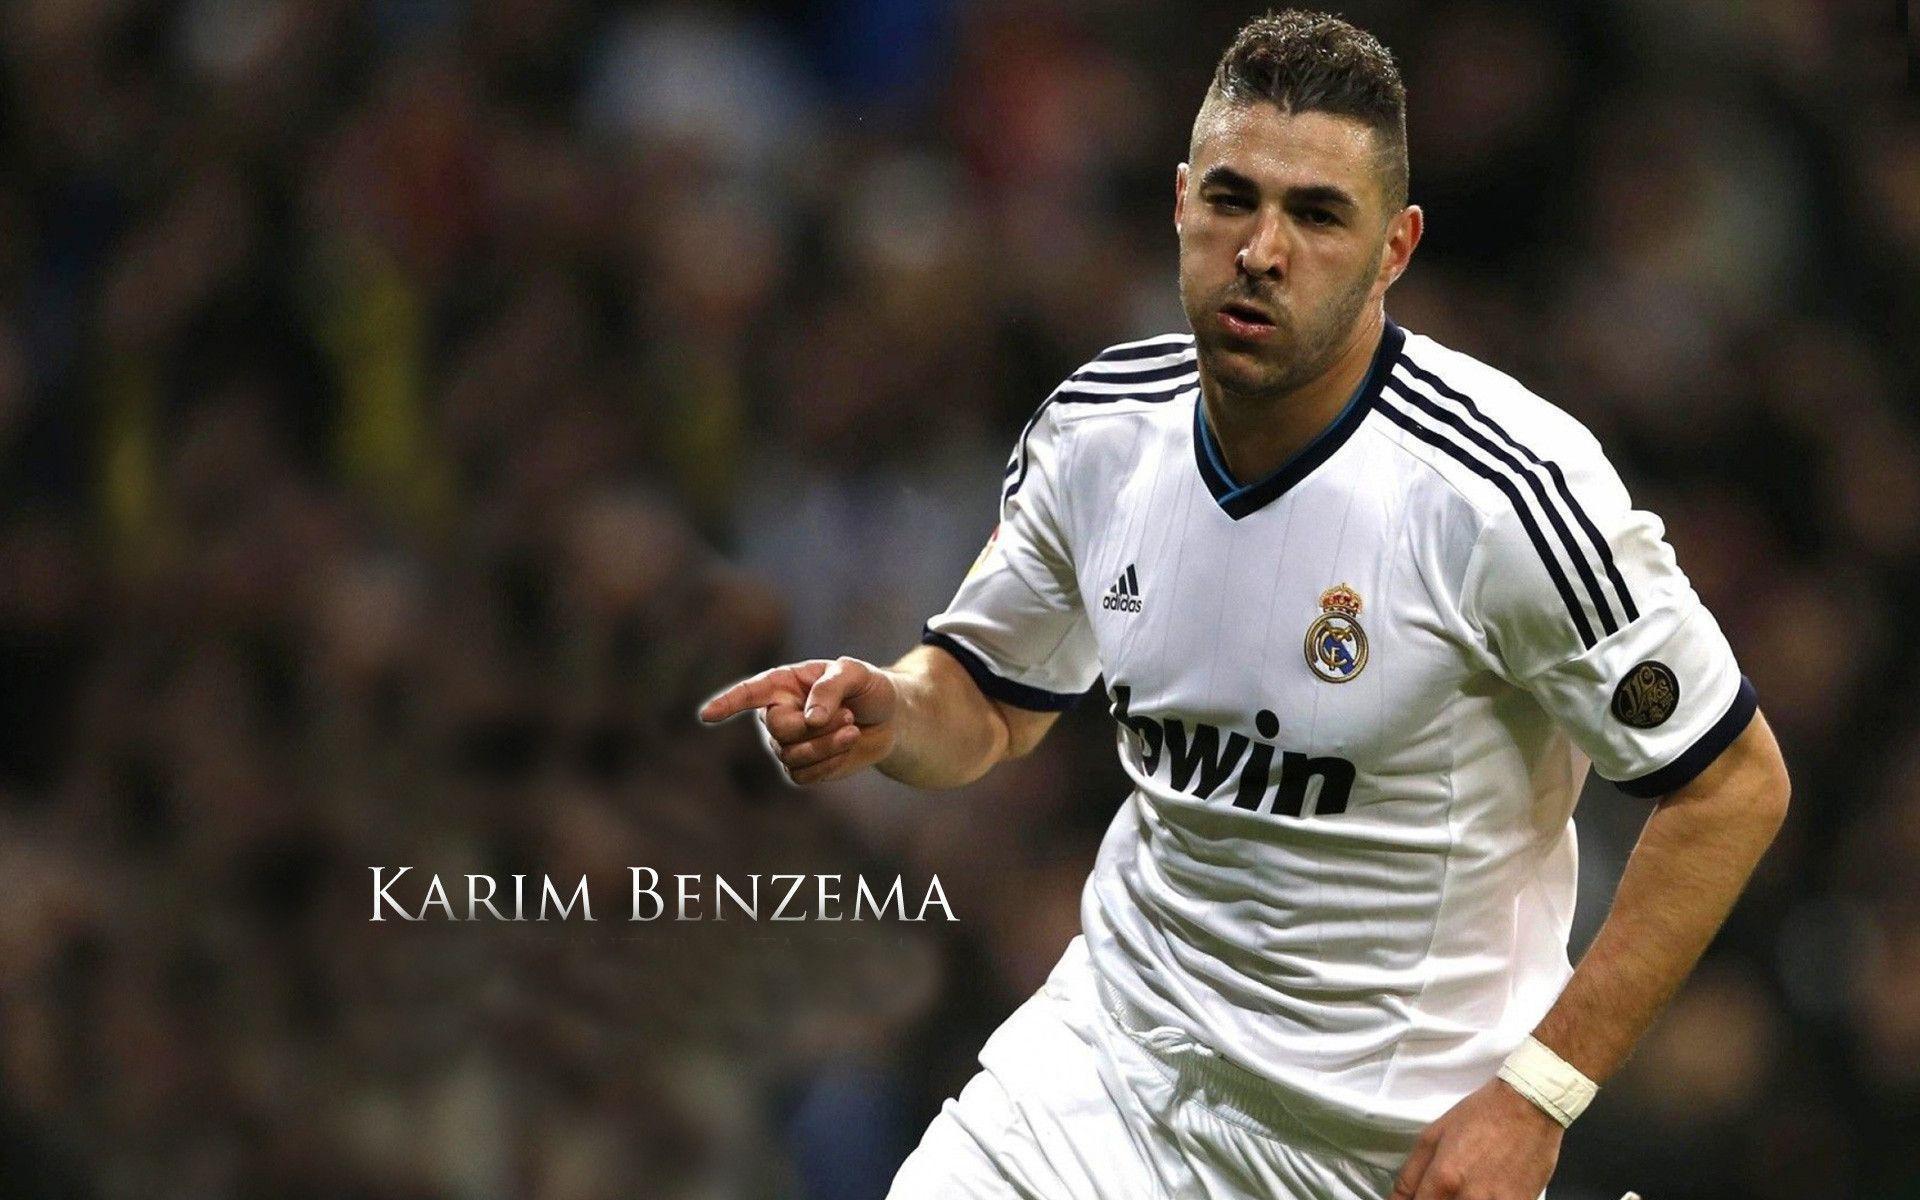 Karim benzema 2015 wallpapers hd 1080p wallpaper cave karim benzema in fifa 2014 worldcup dazzling wallpaper voltagebd Gallery